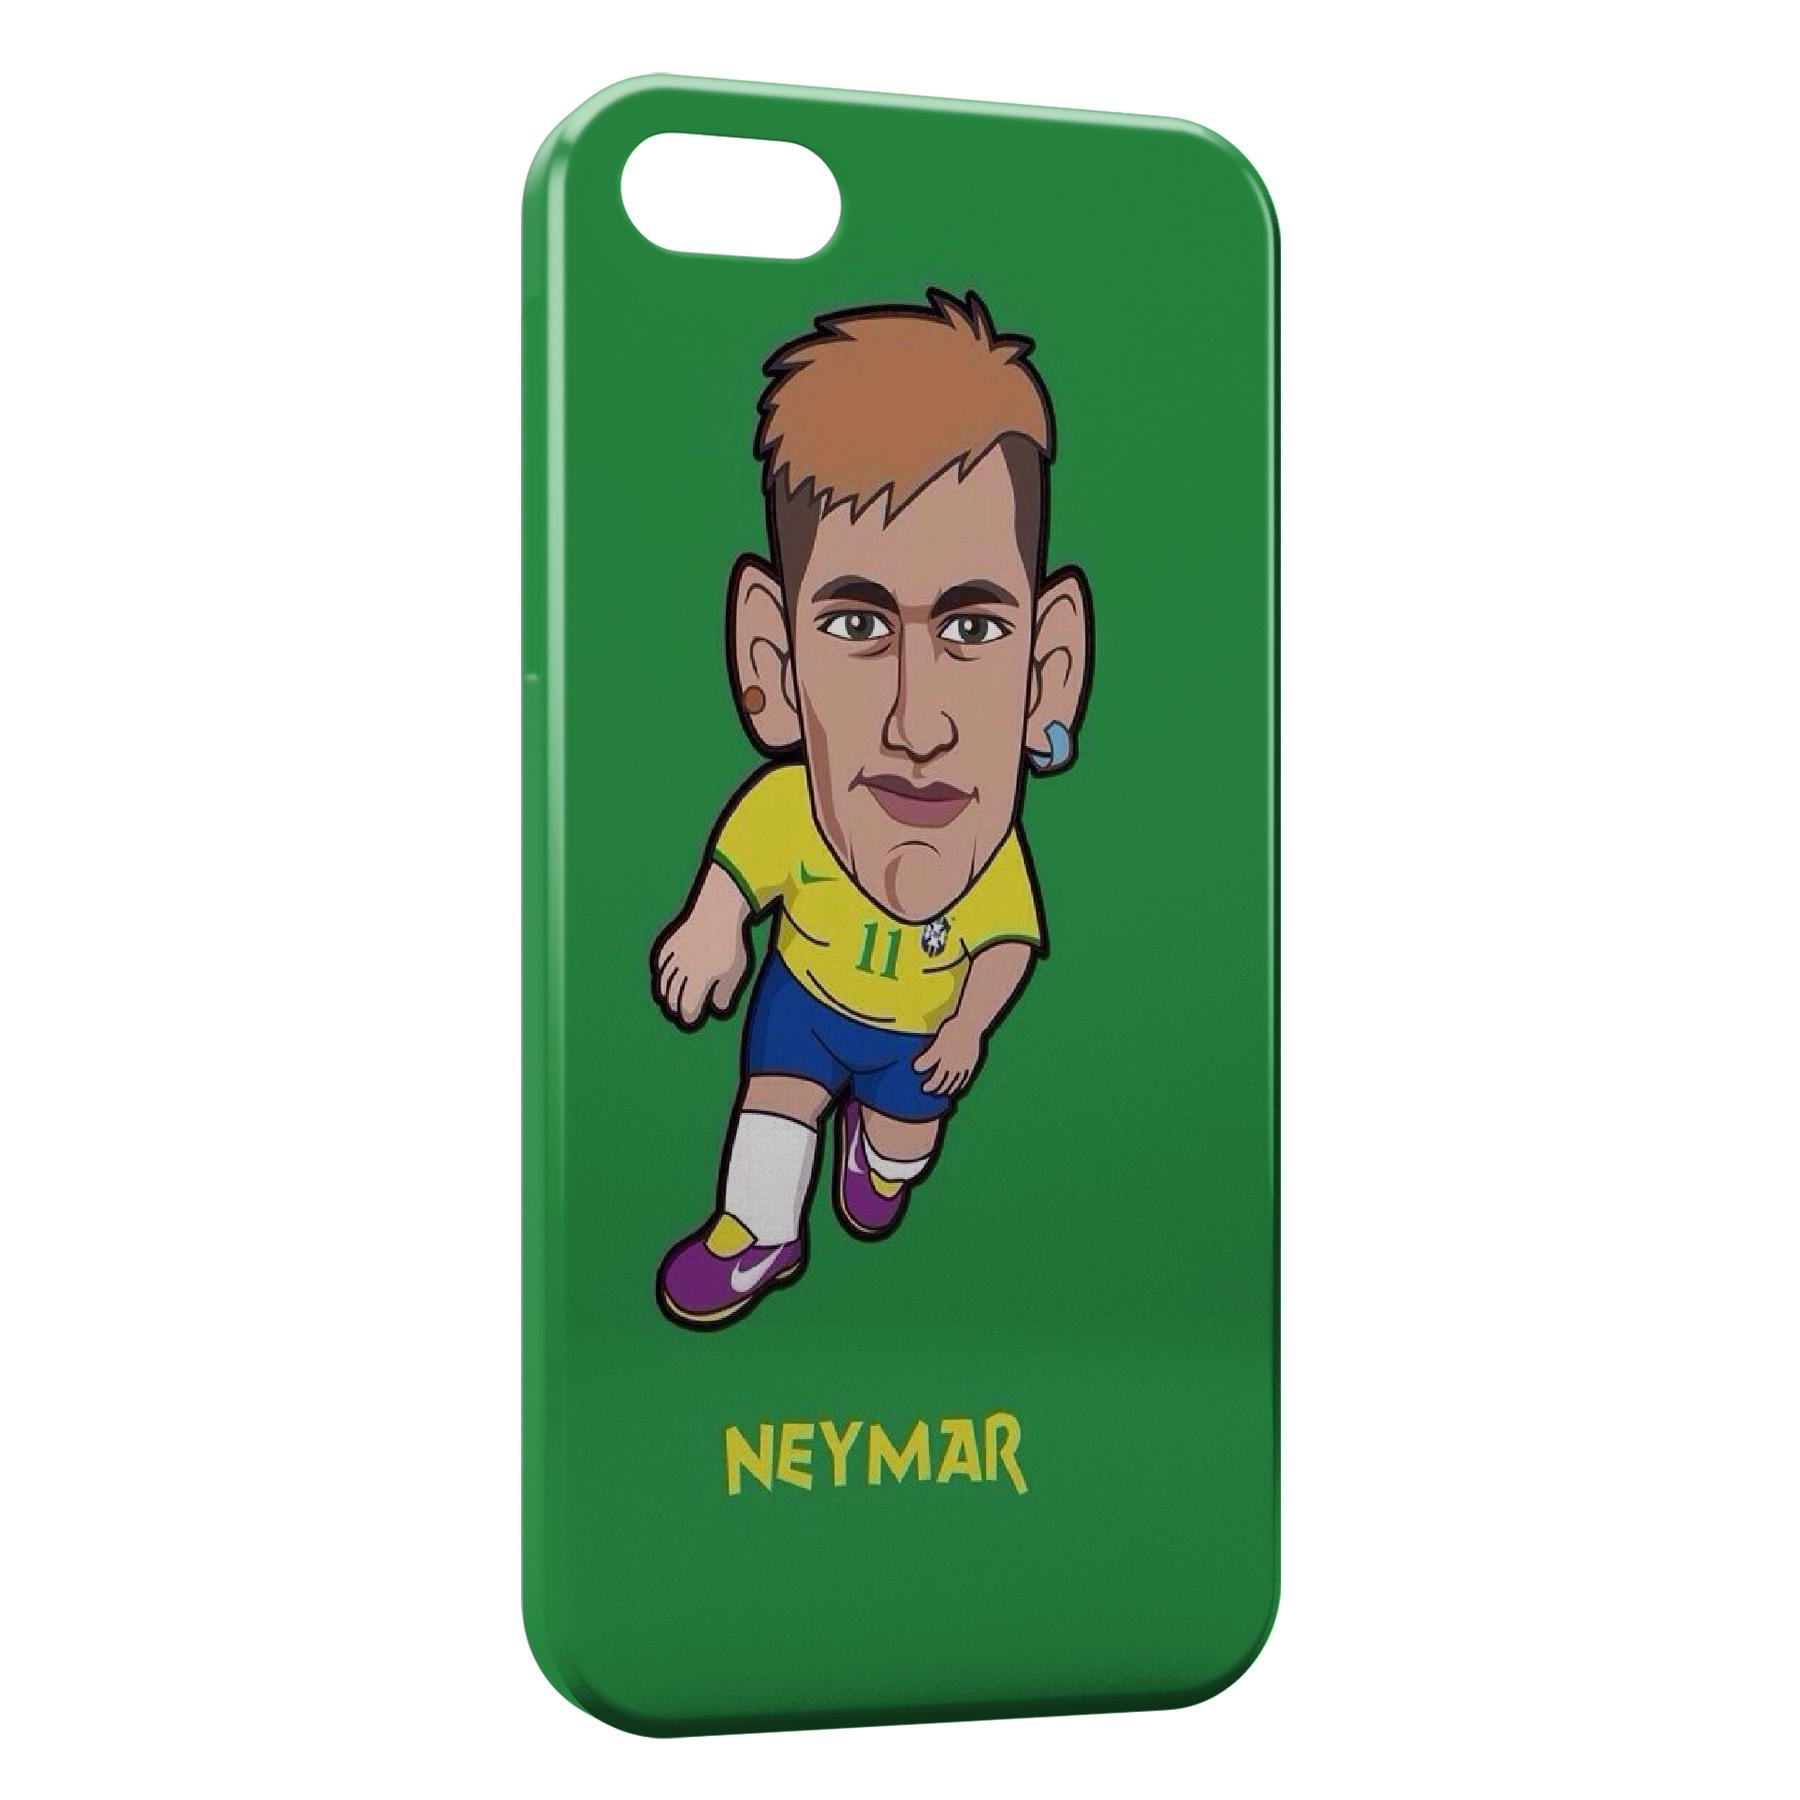 Coque iPhone 5C Neymar Football